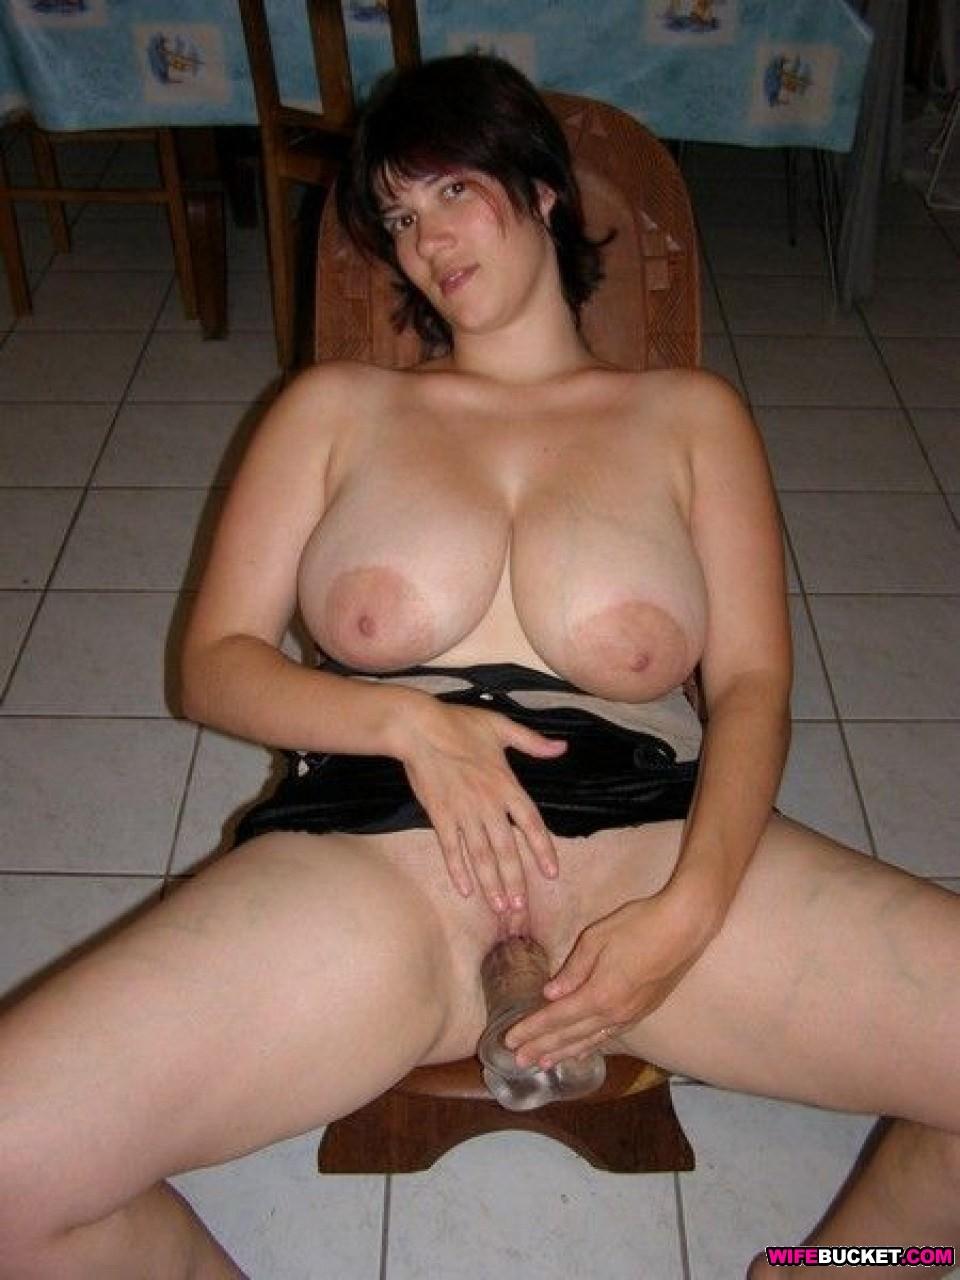 Amateur wife big boobs having sex